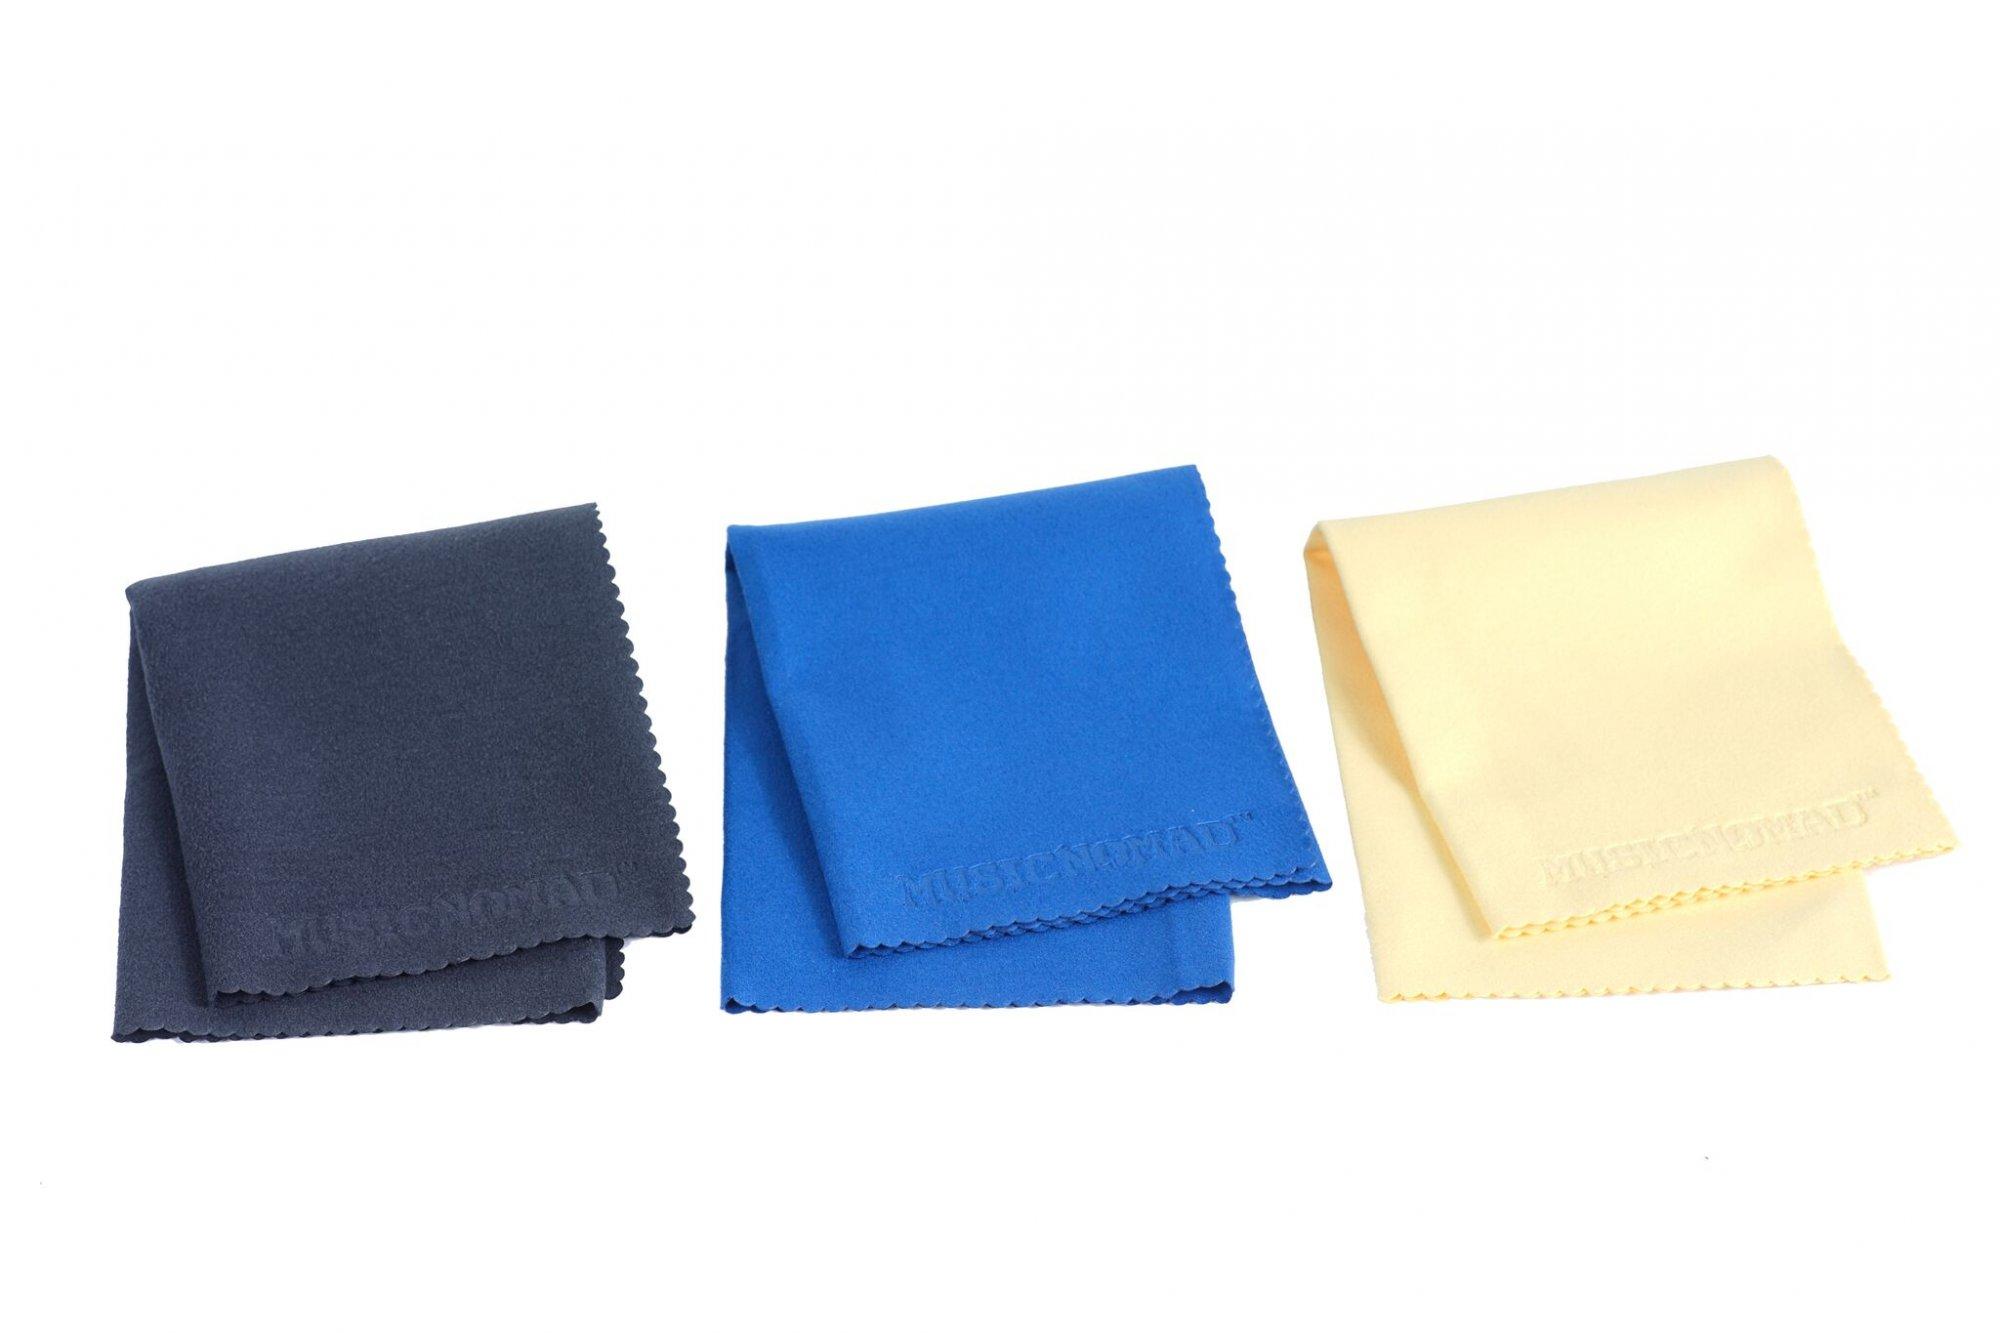 Music Nomad Super Soft Edgeless Microfiber Suede Polishinh Cloth - 3 pack